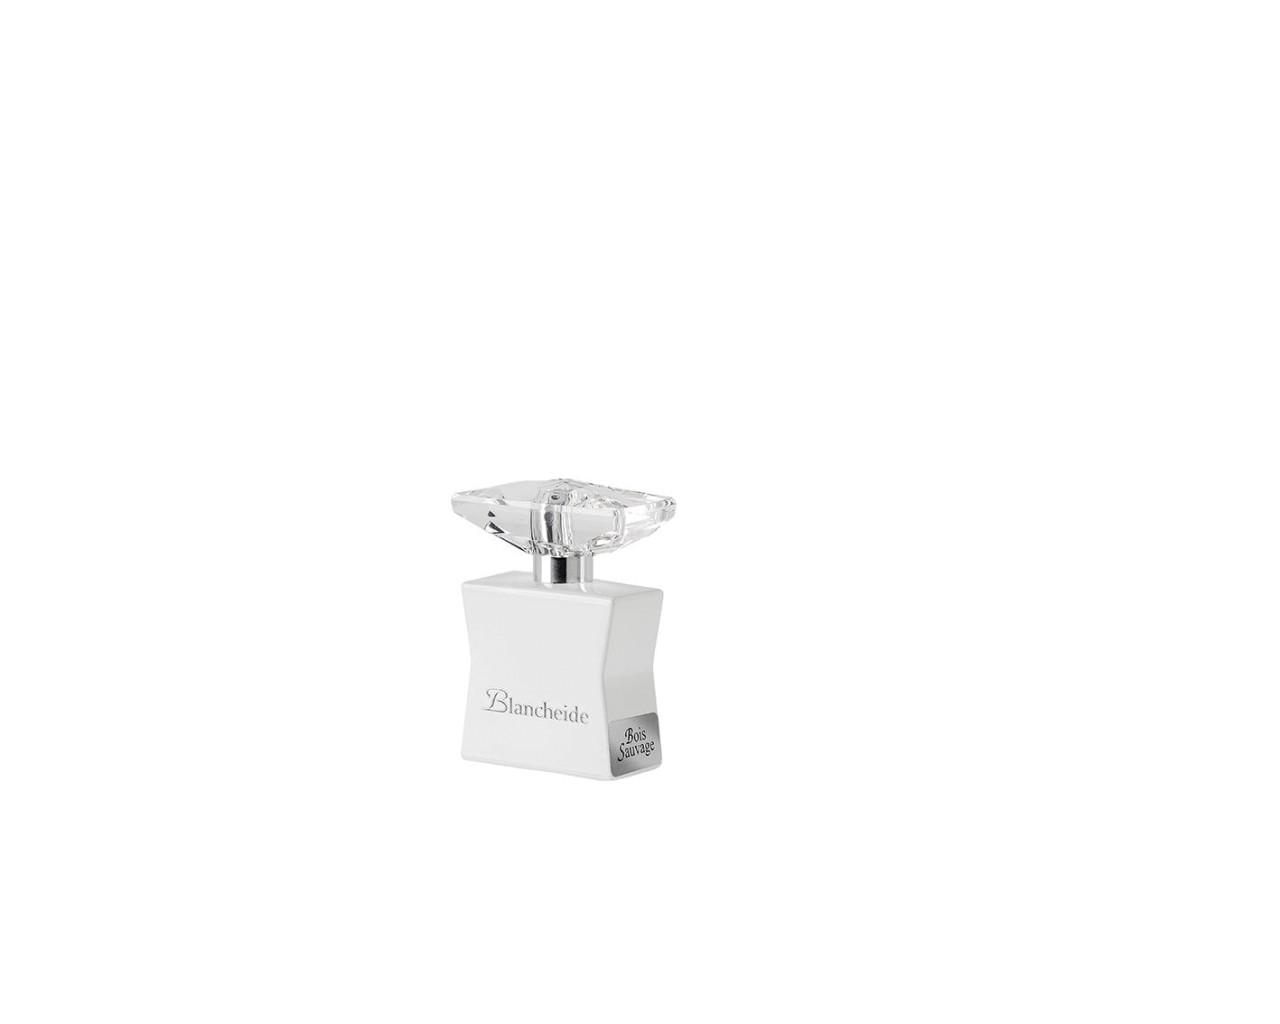 BOIS SAUVAGE BLANCHEIDE EDP 30 ML Blancheide BLAV30BS-01